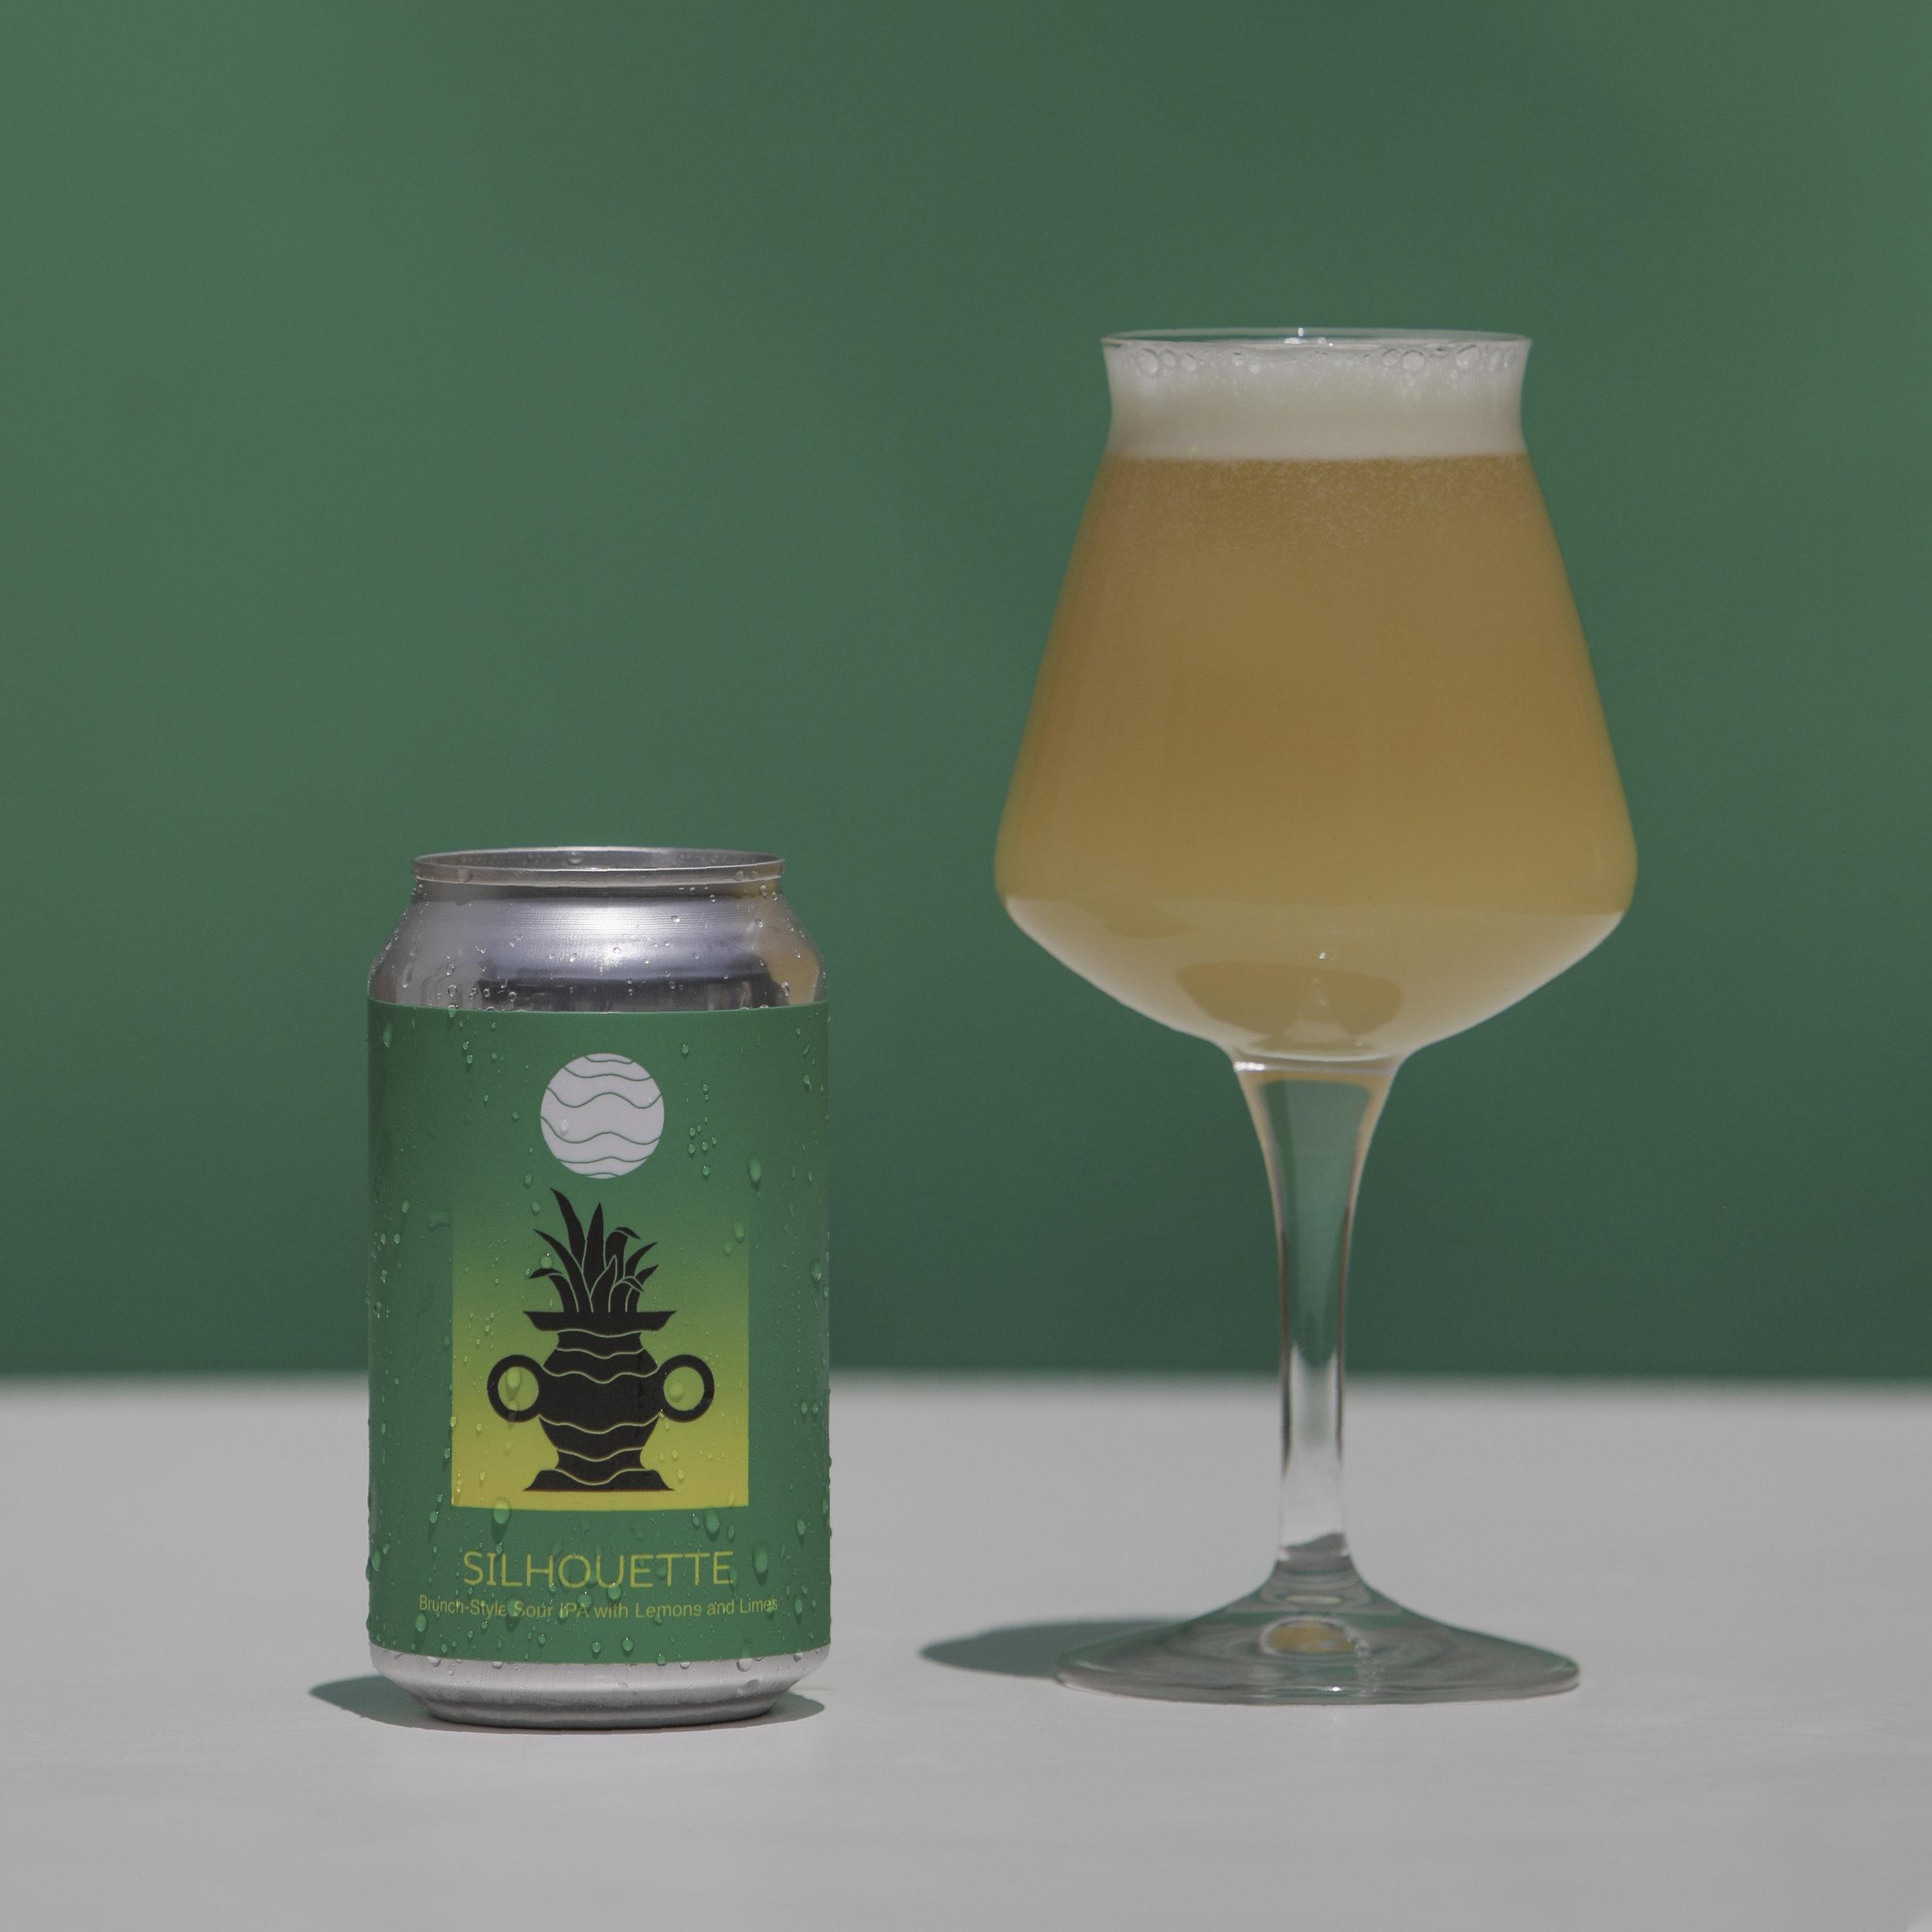 Lemon-Lime Silhouette